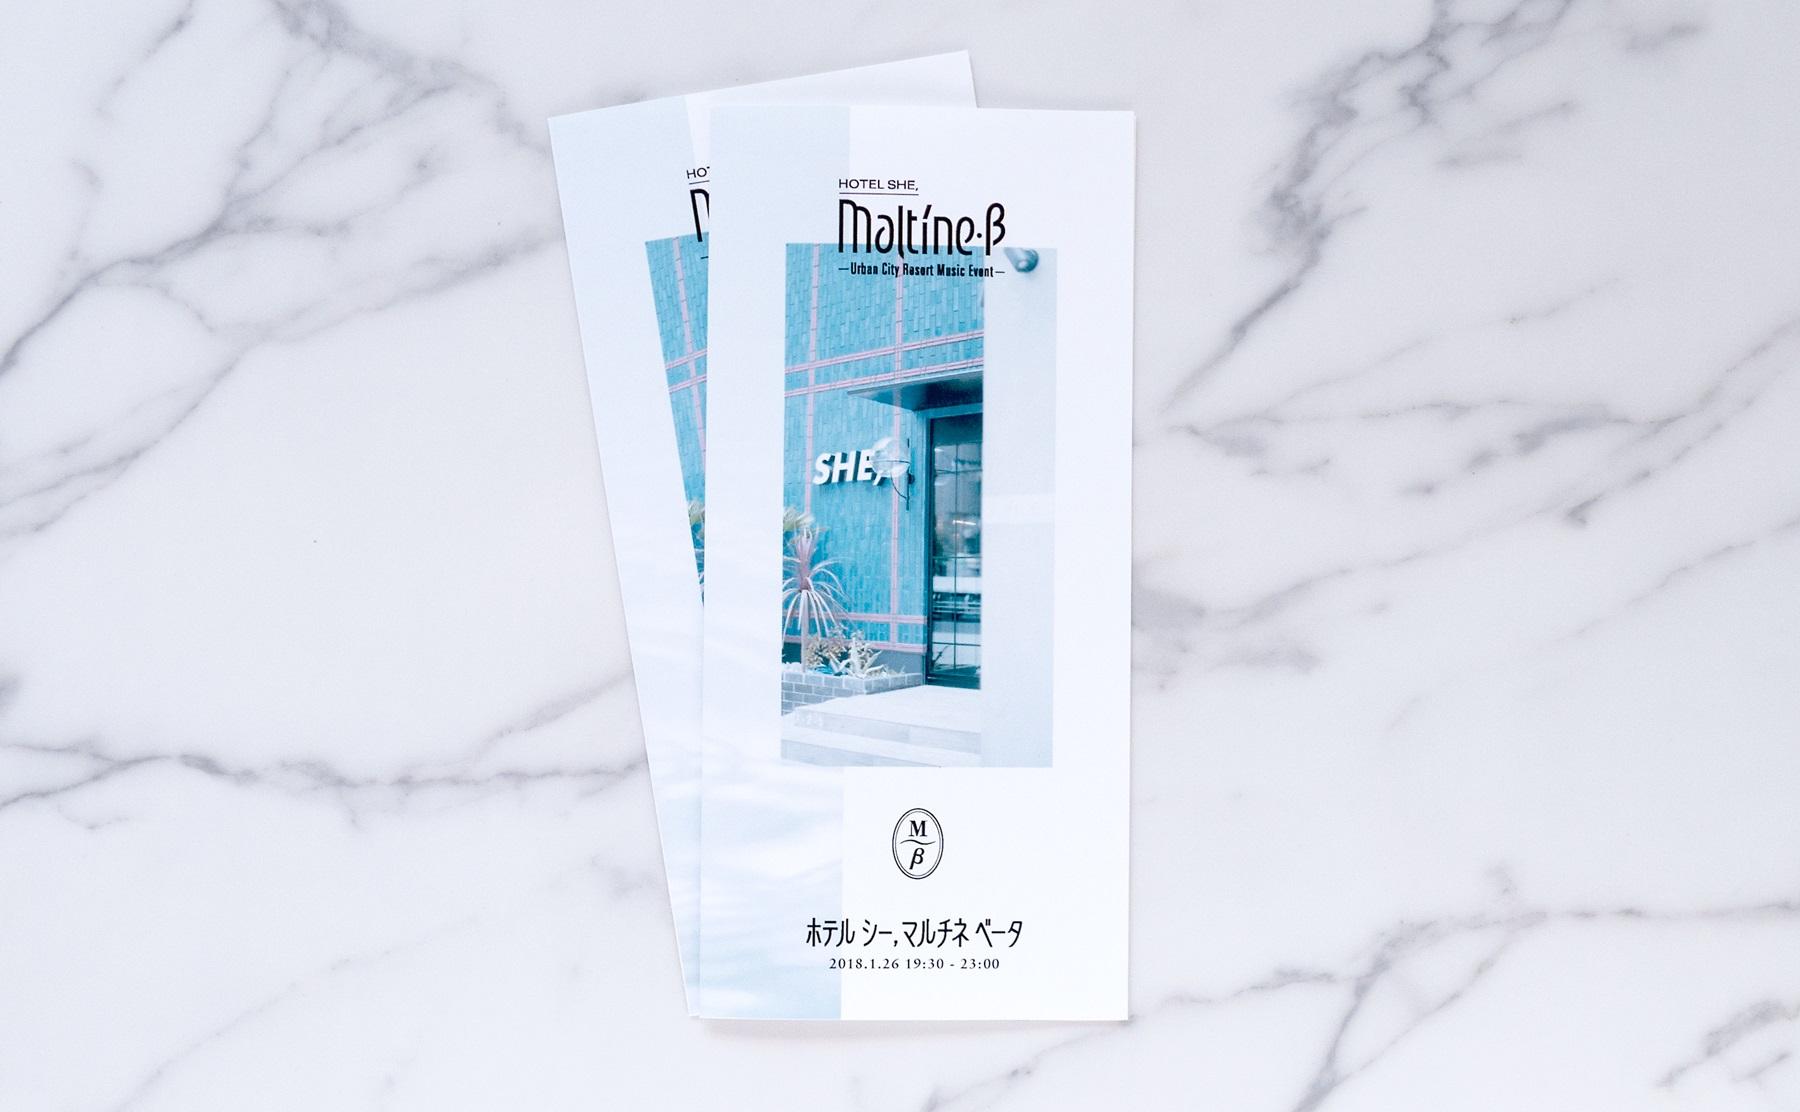 HOTEL SHE, MALTINE β_Main